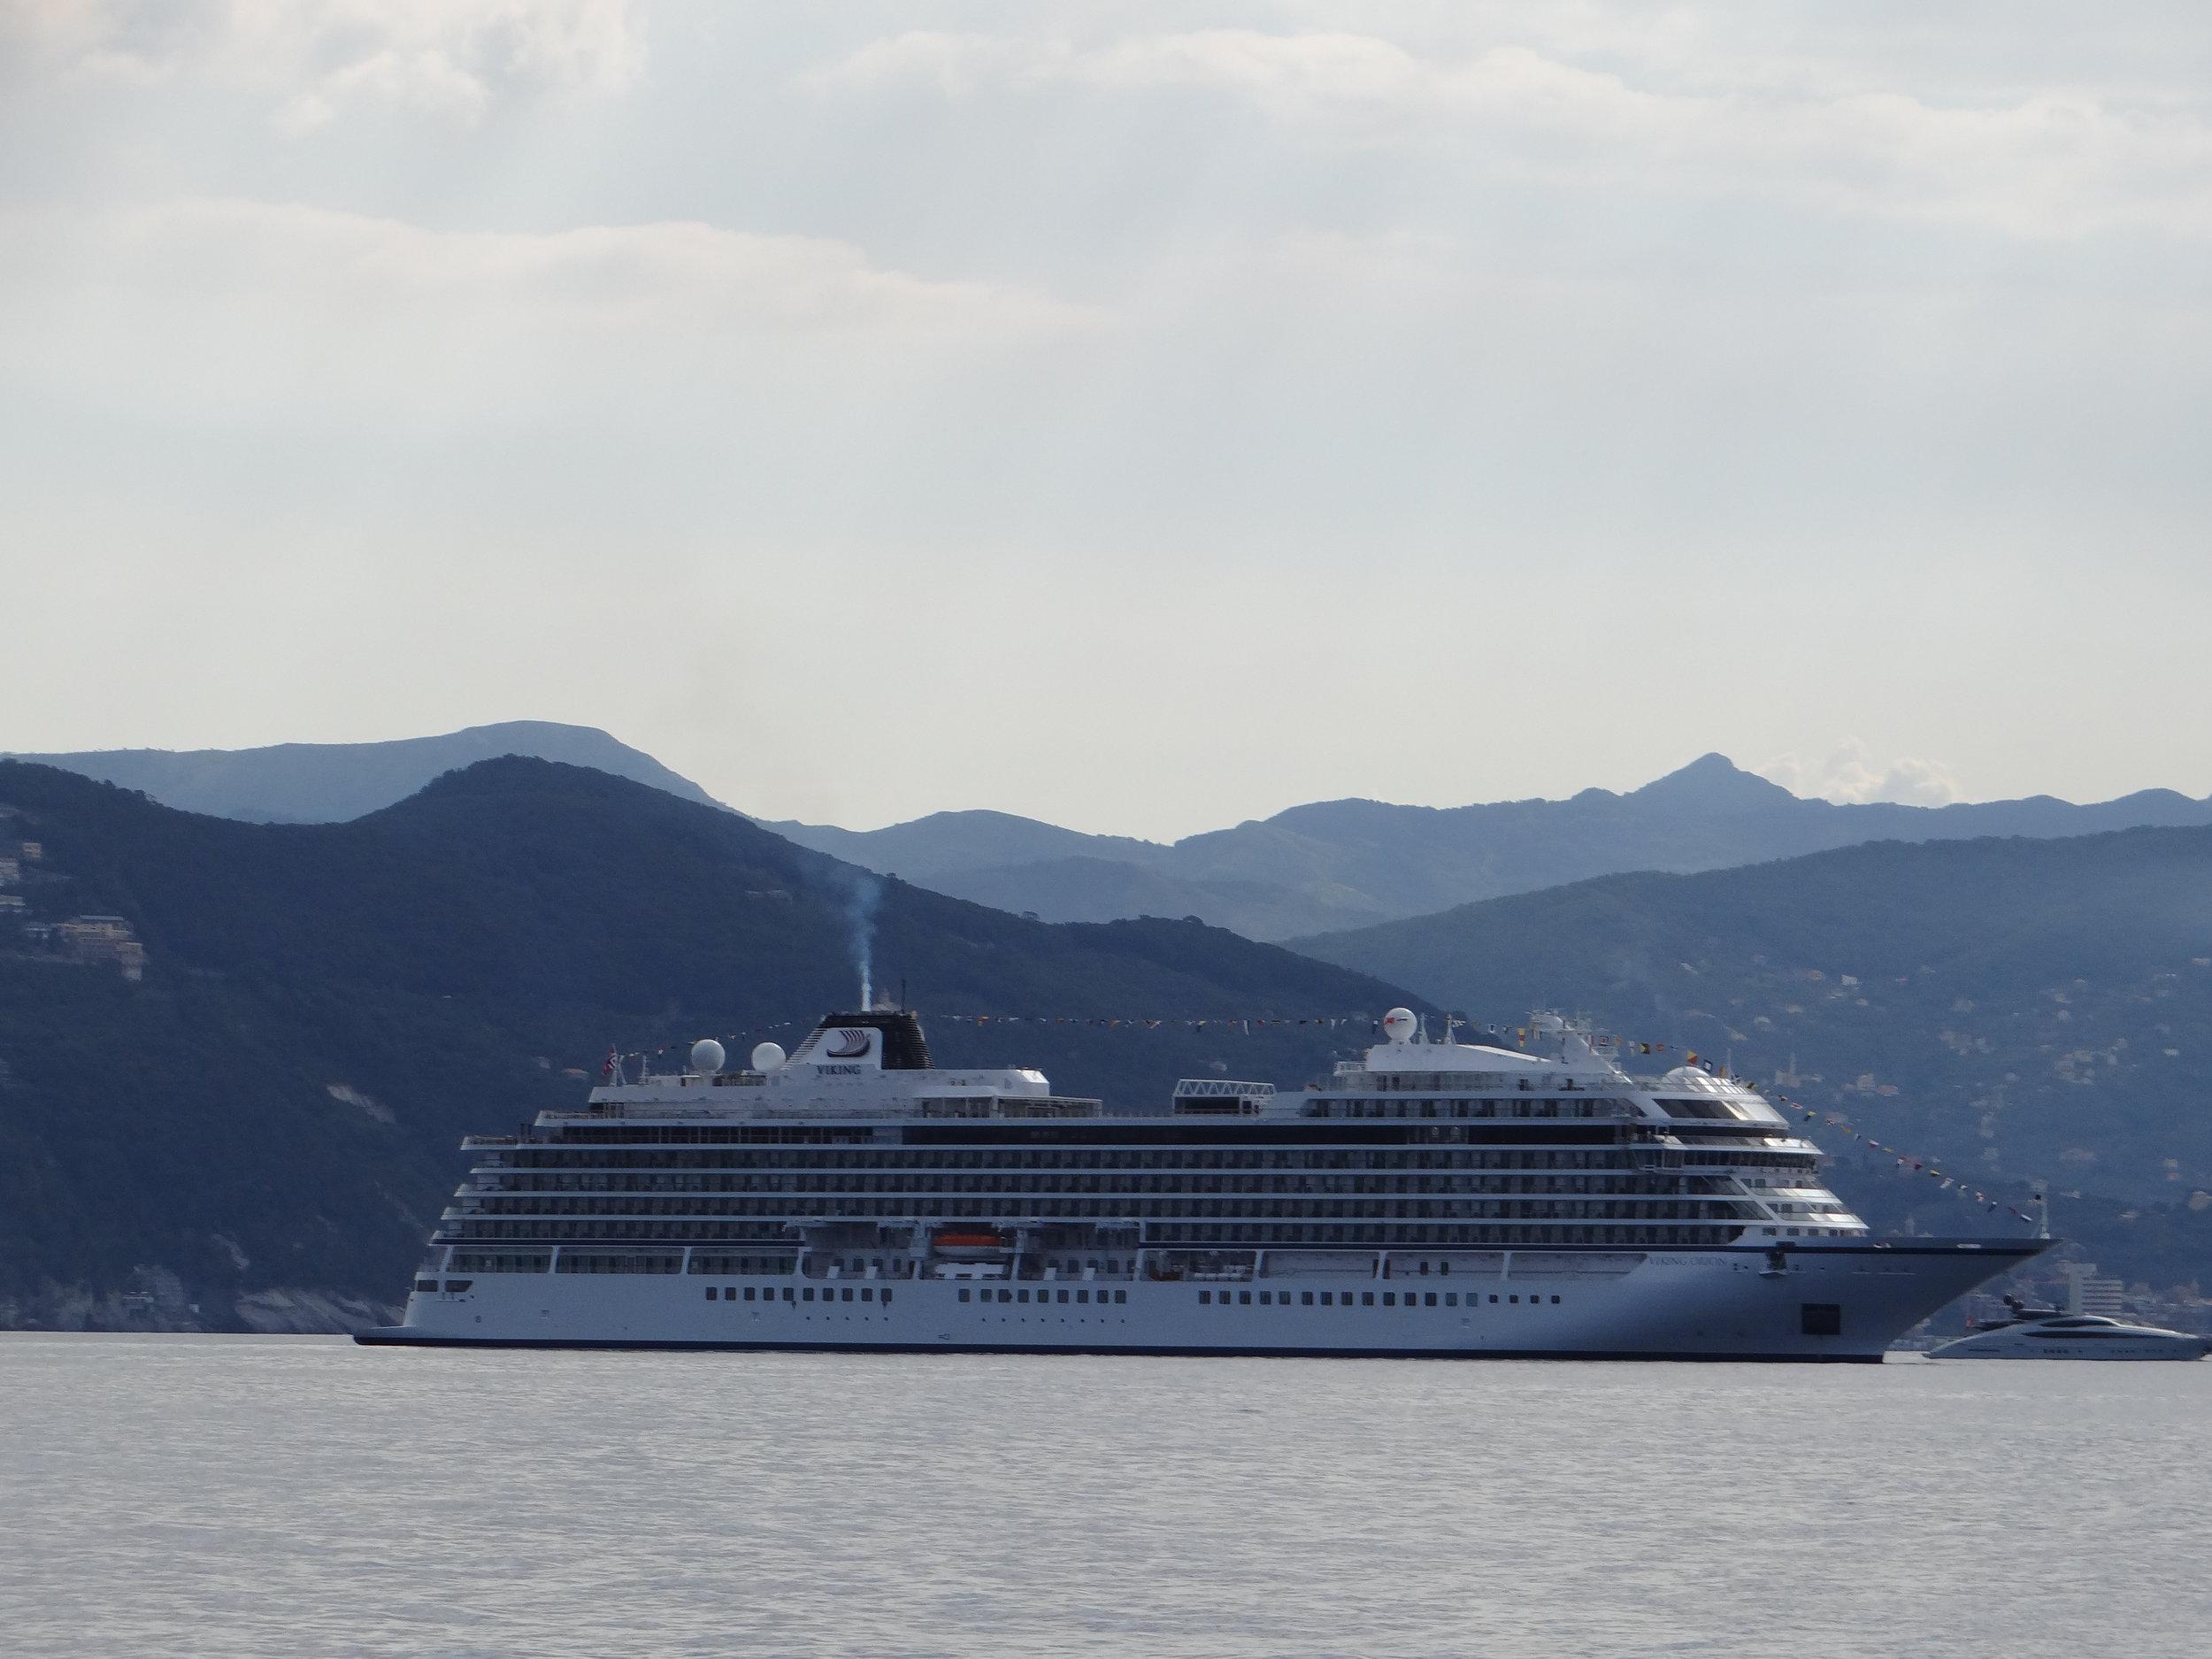 The Viking Orion, anchored off Portofino, Italy